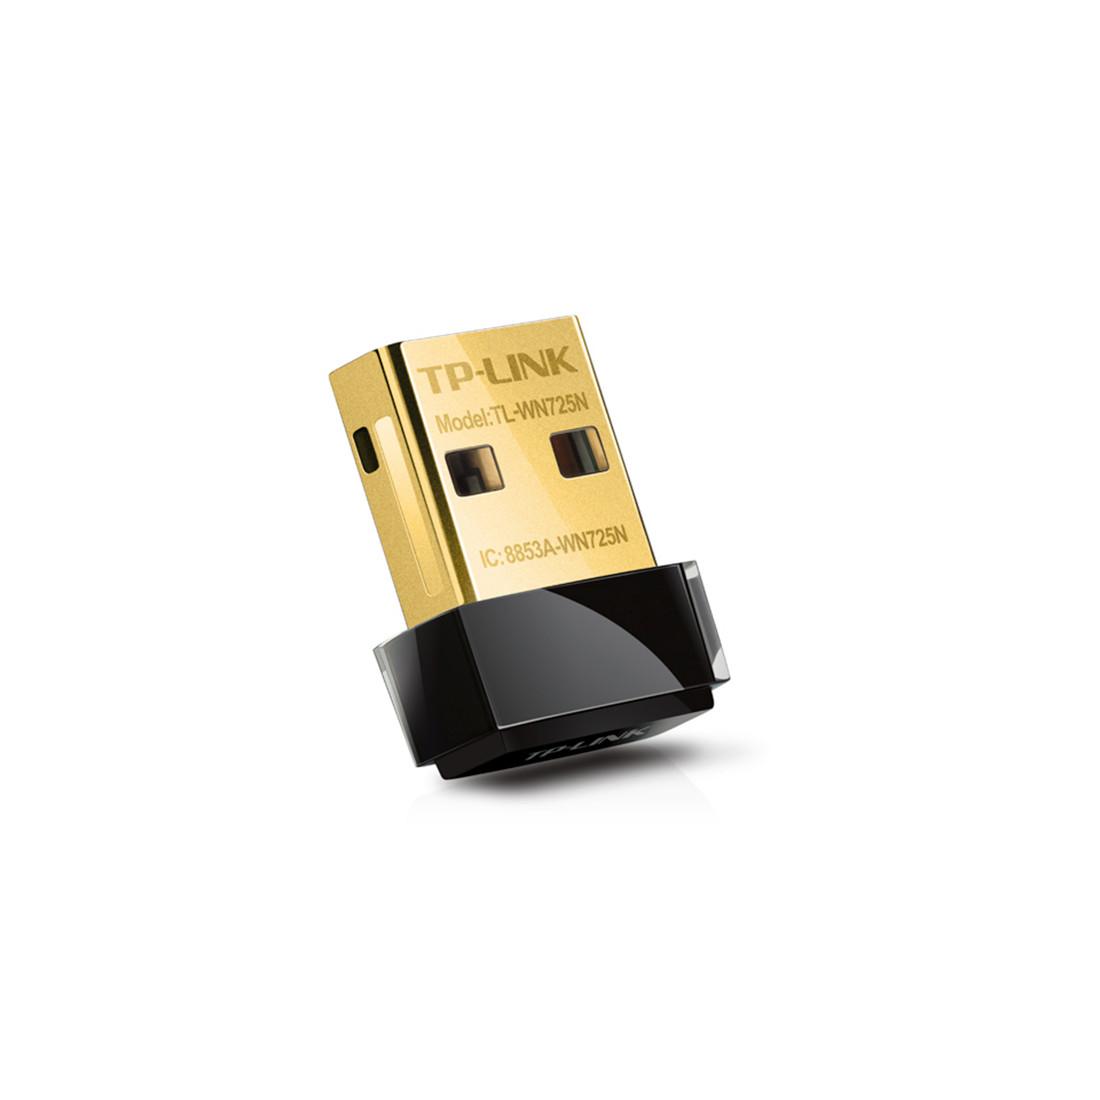 Сетевой адаптер беспроводной USB 150M Tp-Link TL-WN725N